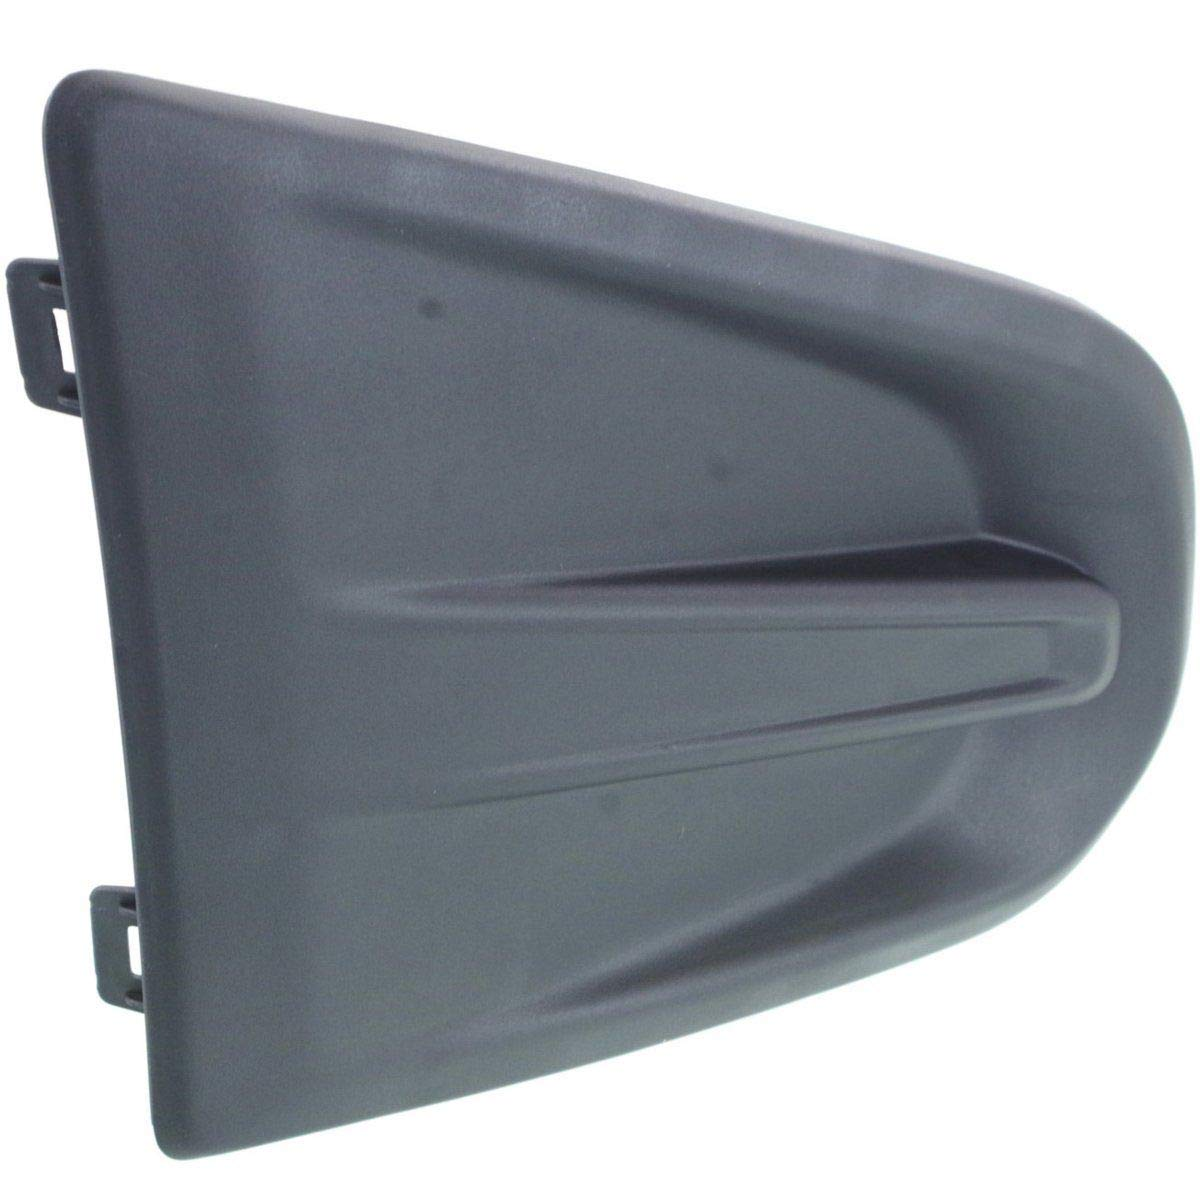 New Tow Eye Cover Fog light Lower bumper grill Front Passenger Right Side RH